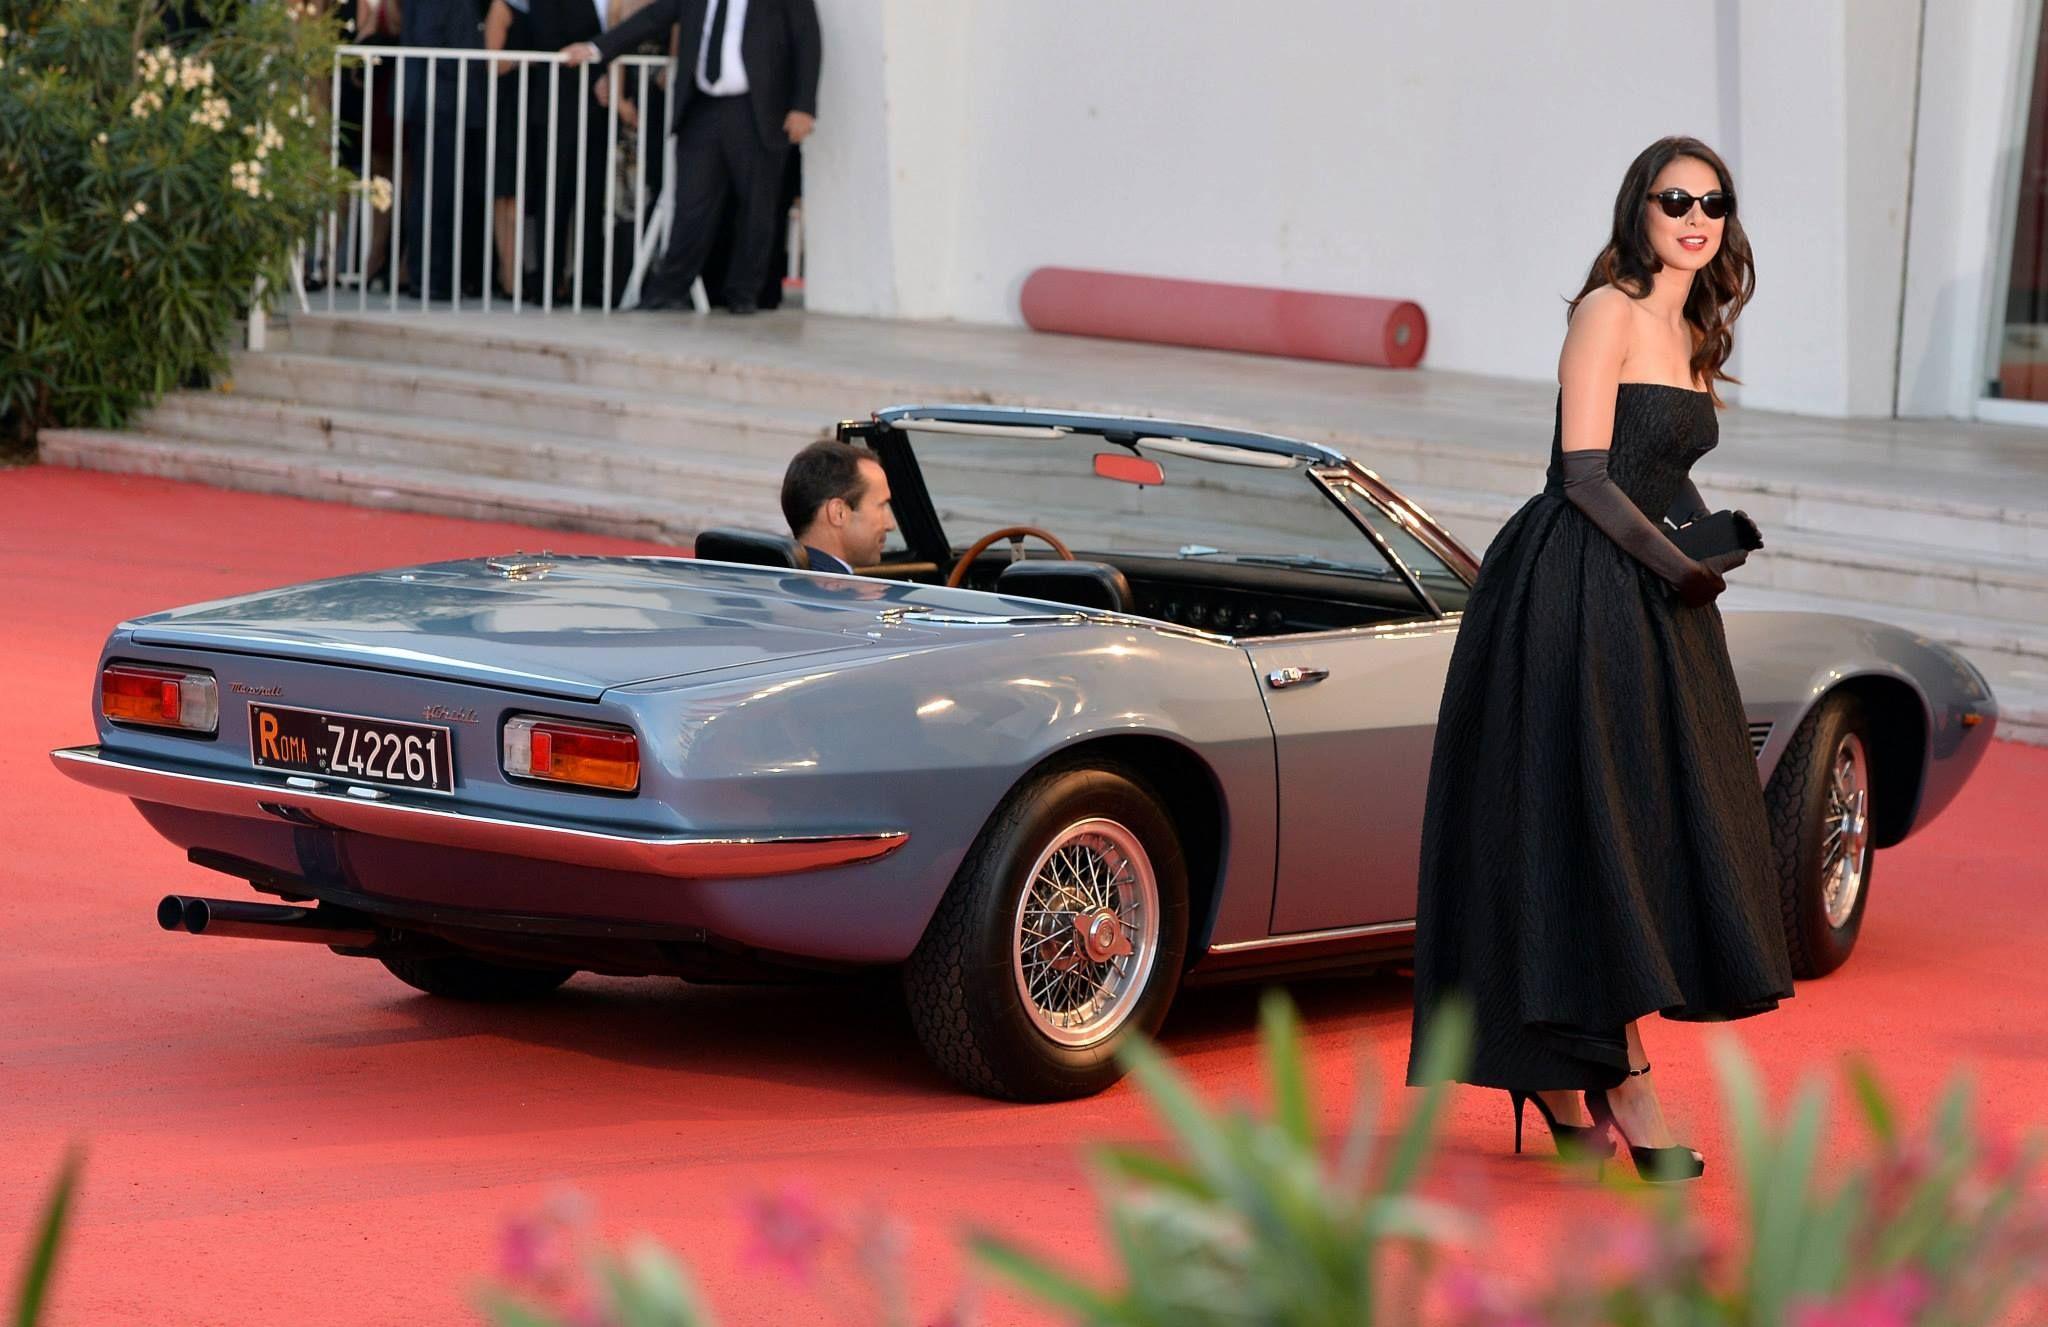 Actress Moran Atias arrives in a classic Maserati Ghibli Spyder from the '60s.  #Venezia70